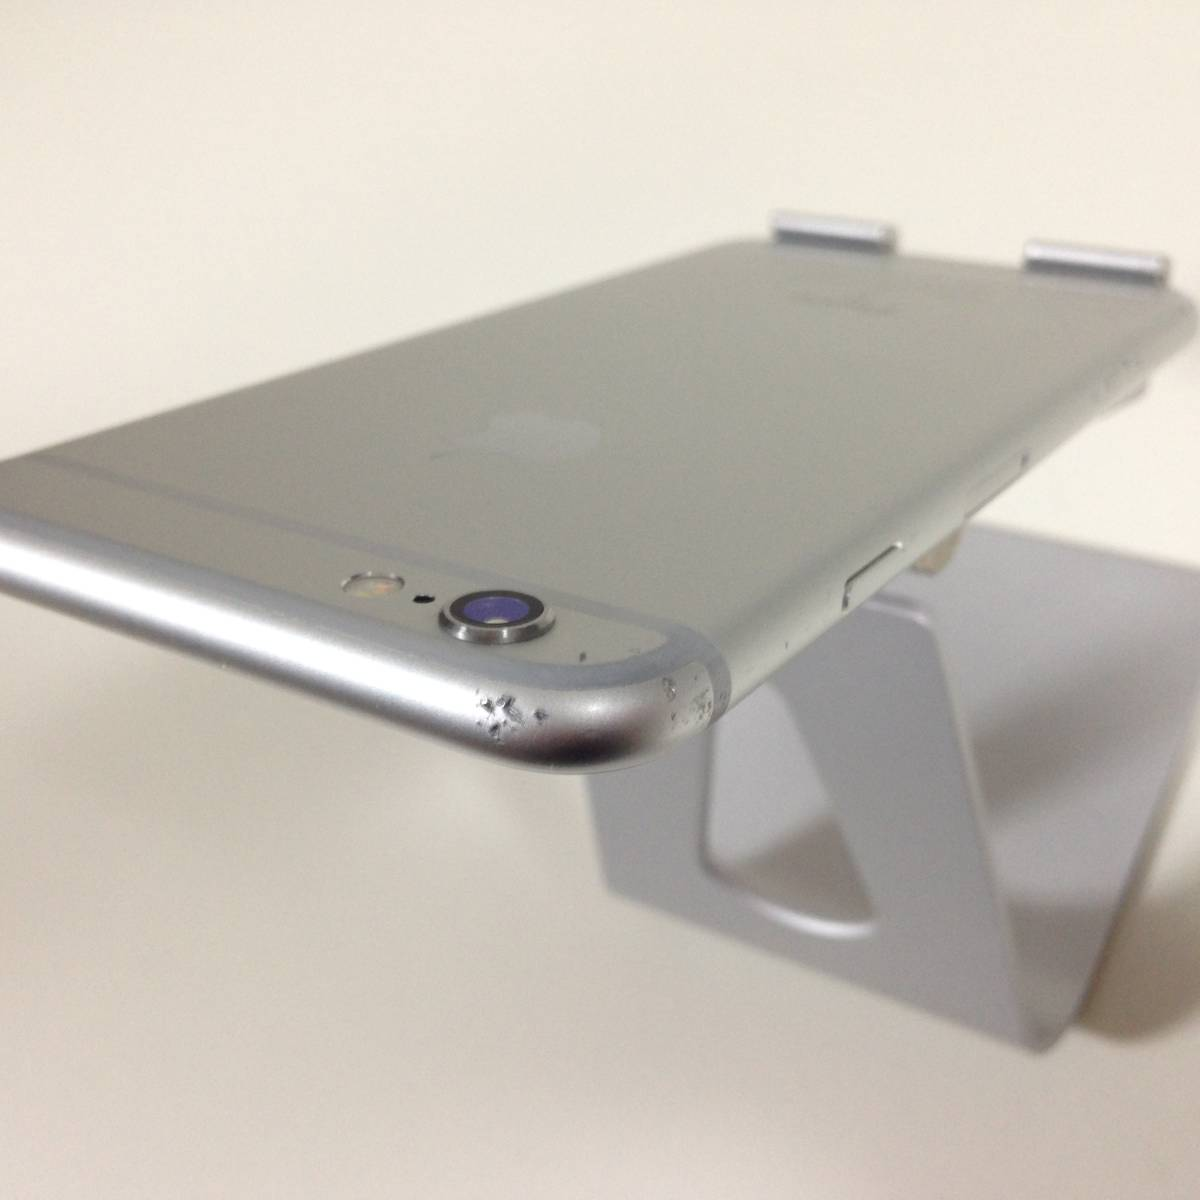 iPhone6s docomo 64GB シルバー MKQP2_d8845_画像4